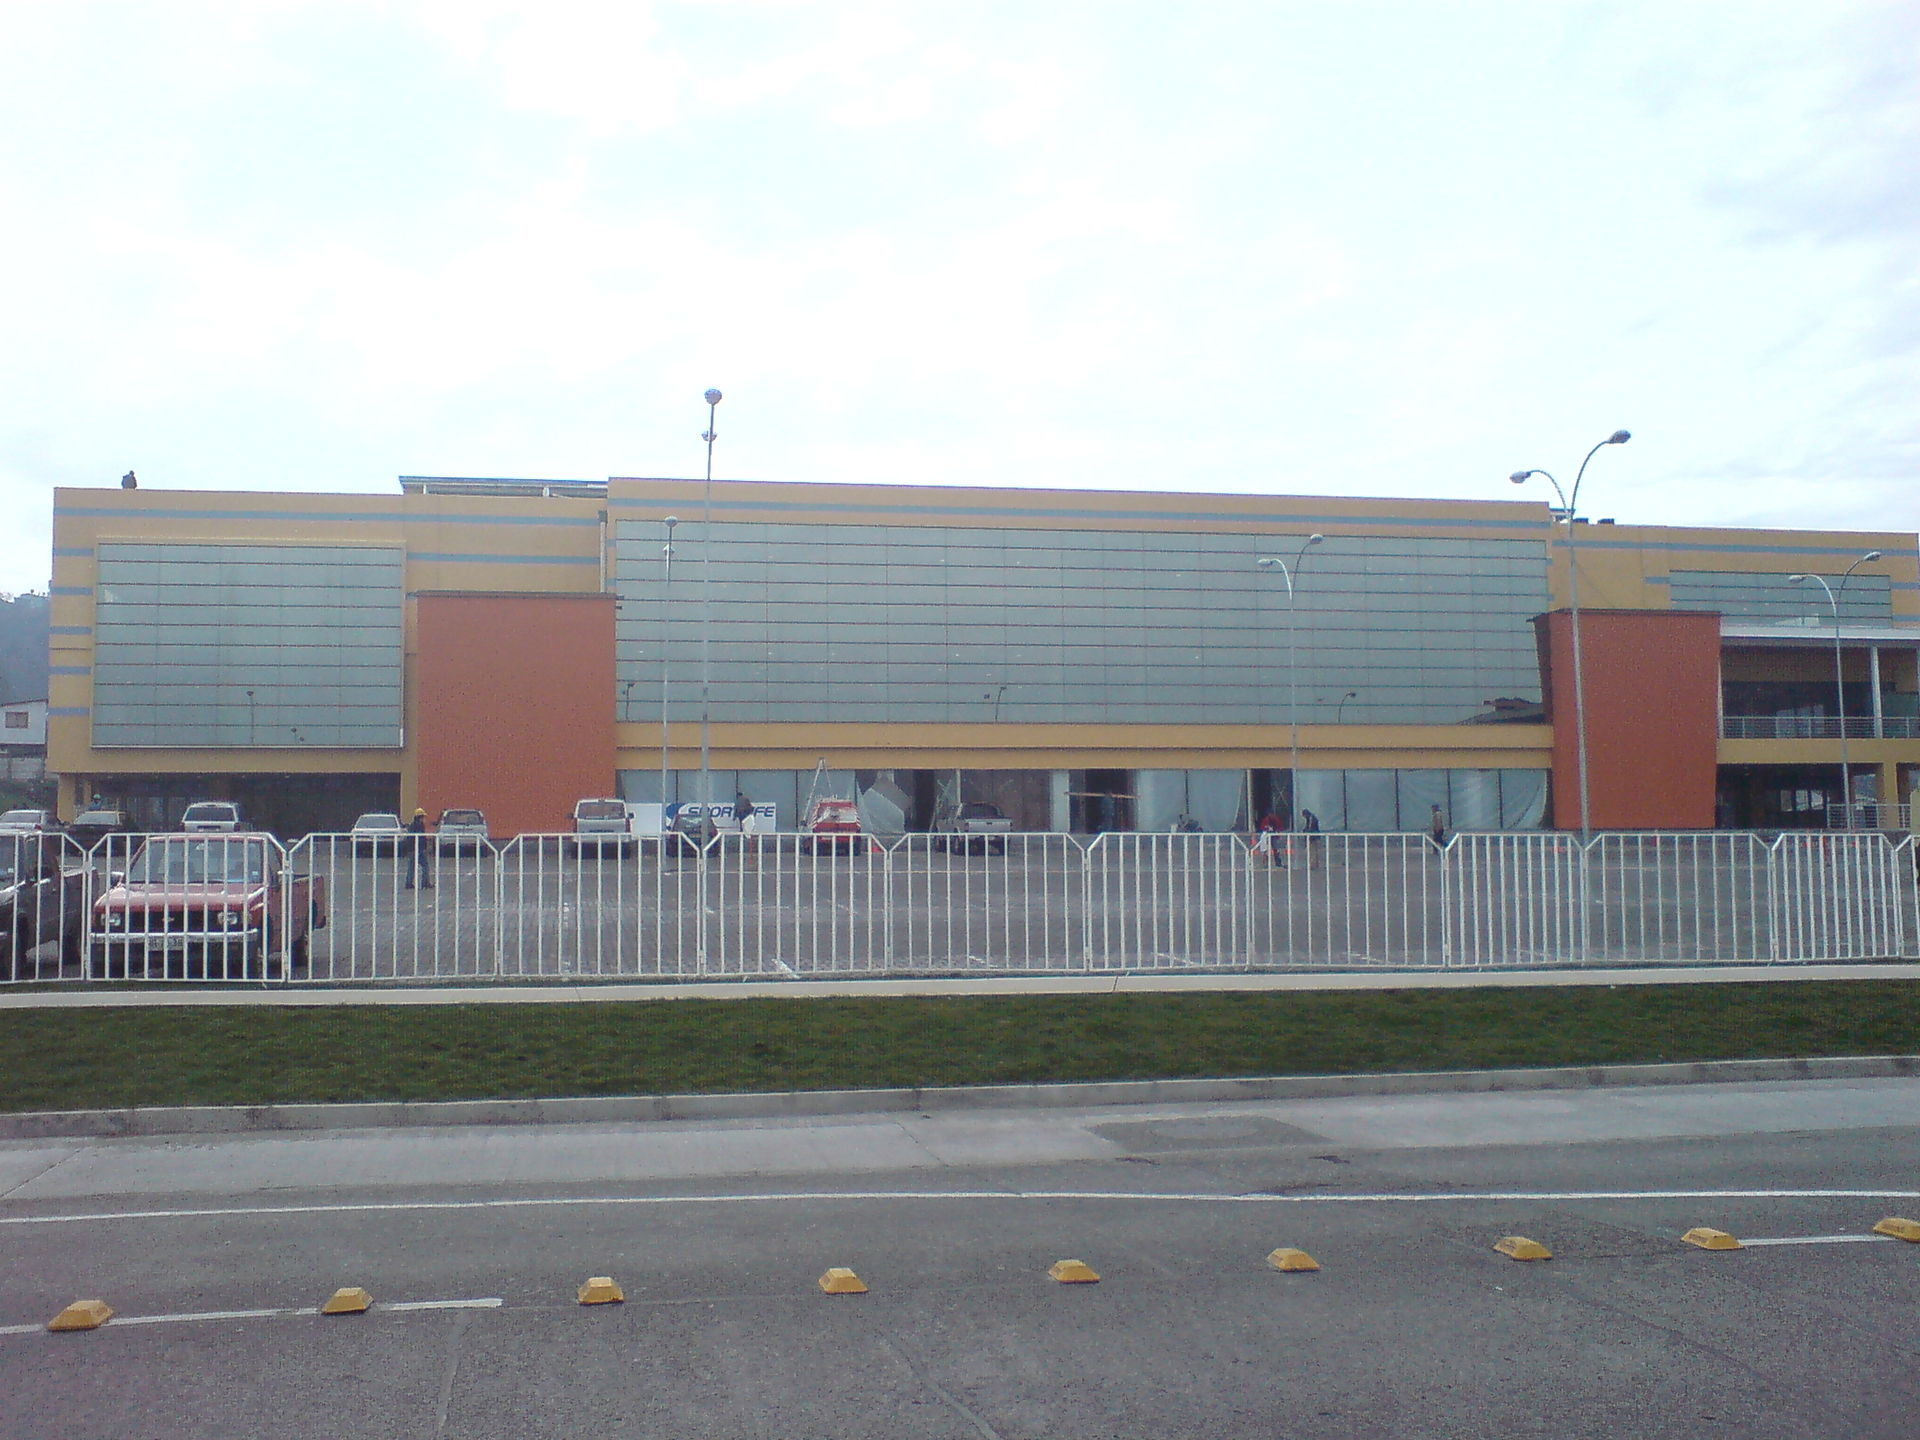 Arena puerto montt wikipedia la enciclopedia libre for Gimnasio arena